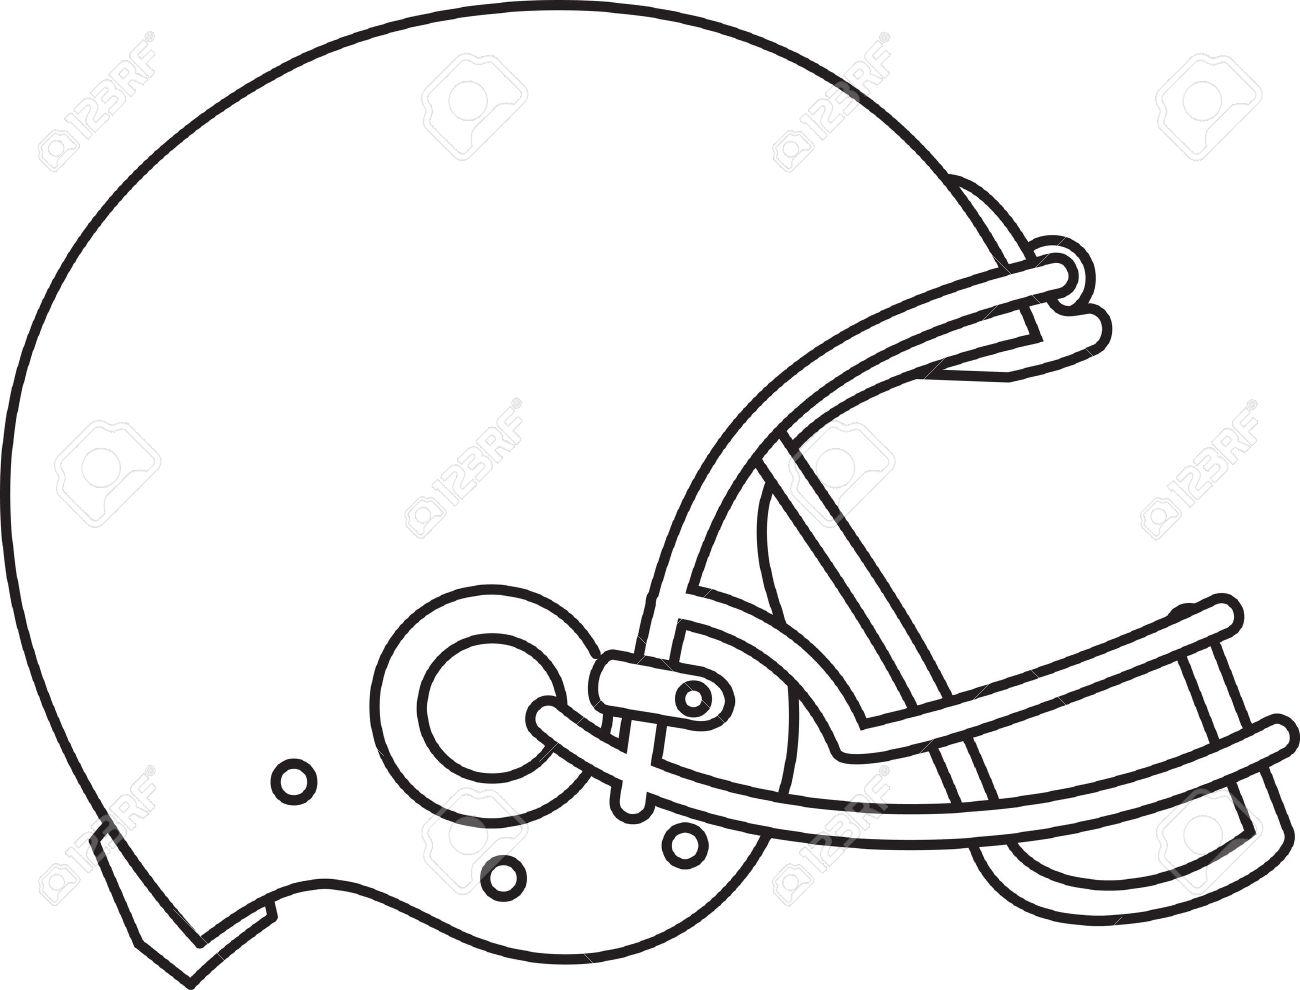 1300x990 Line Drawing Illustration Of An American Football Helmet Viewed